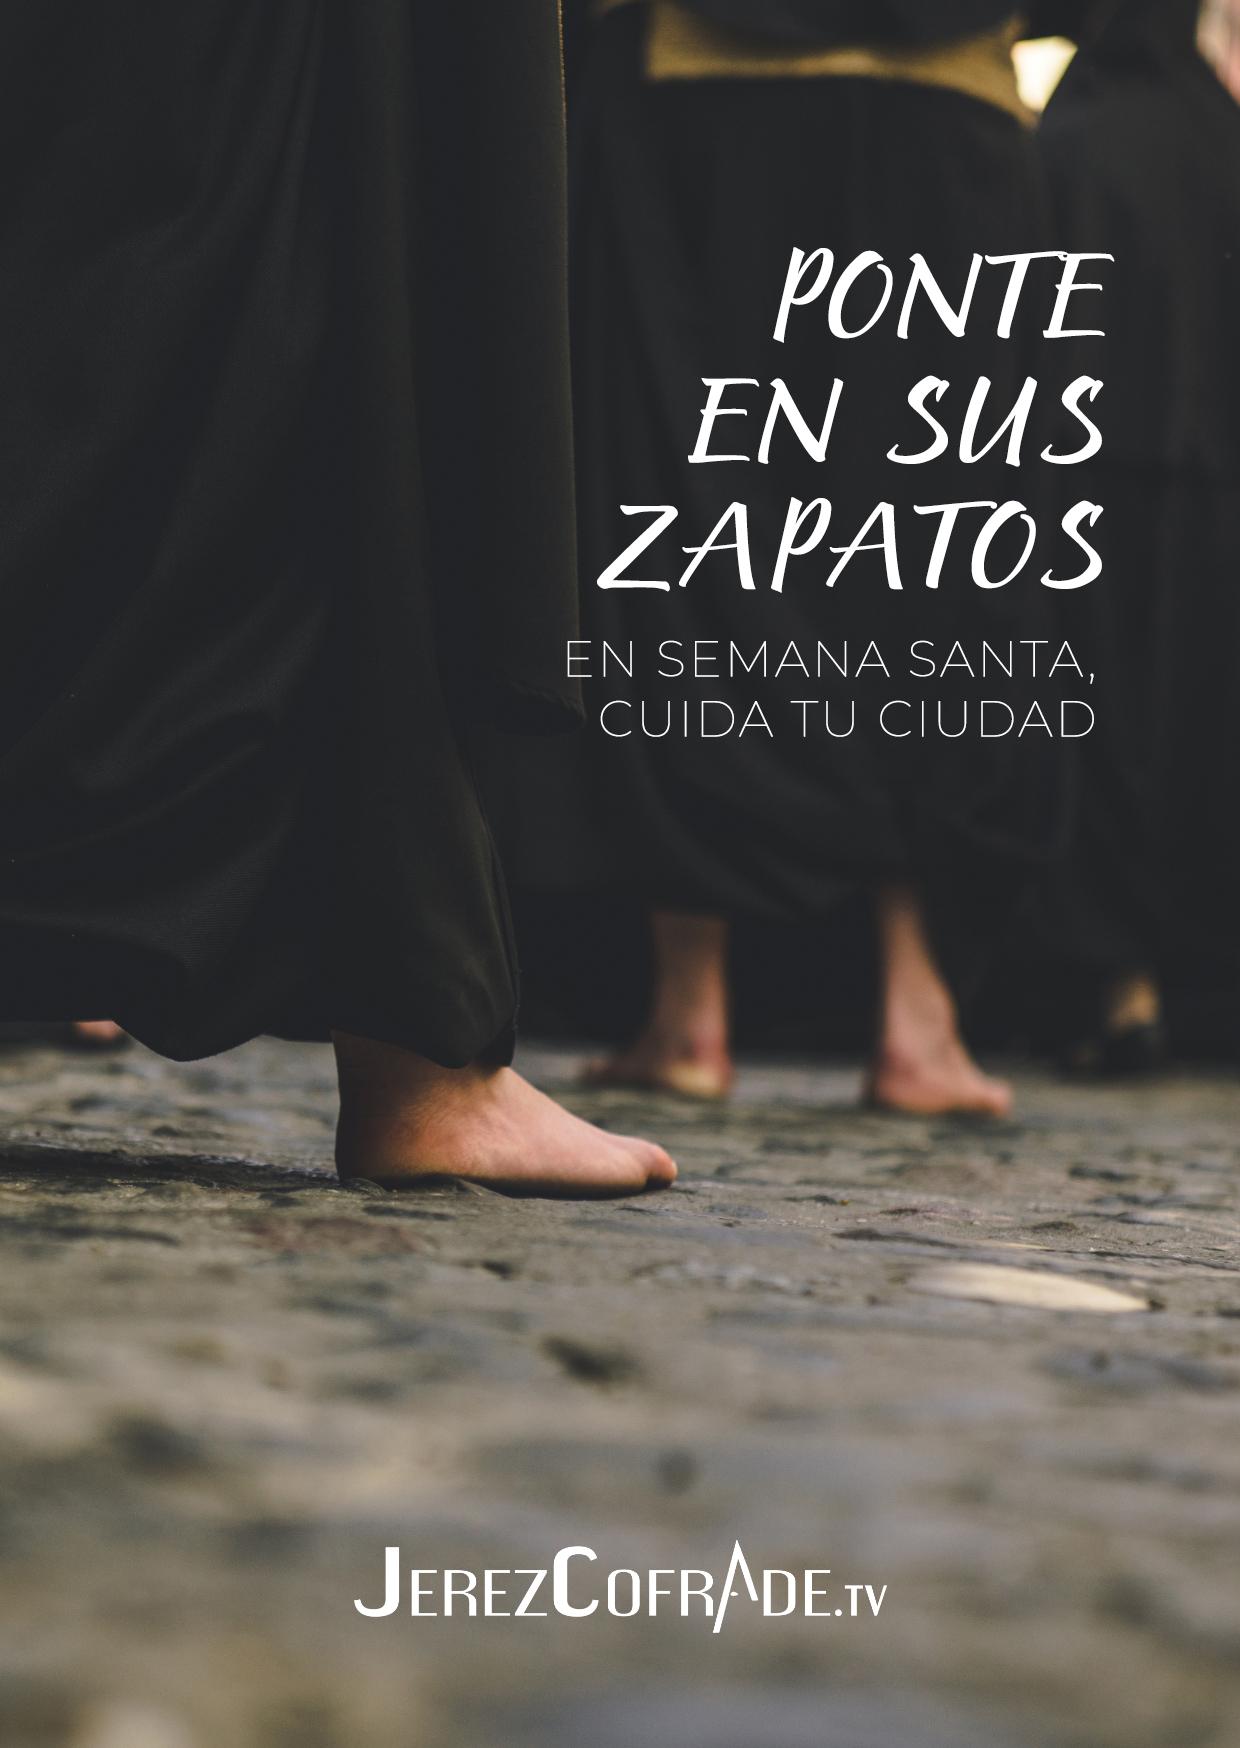 RSC-JerezCofrade-PonteEnSusZapatos